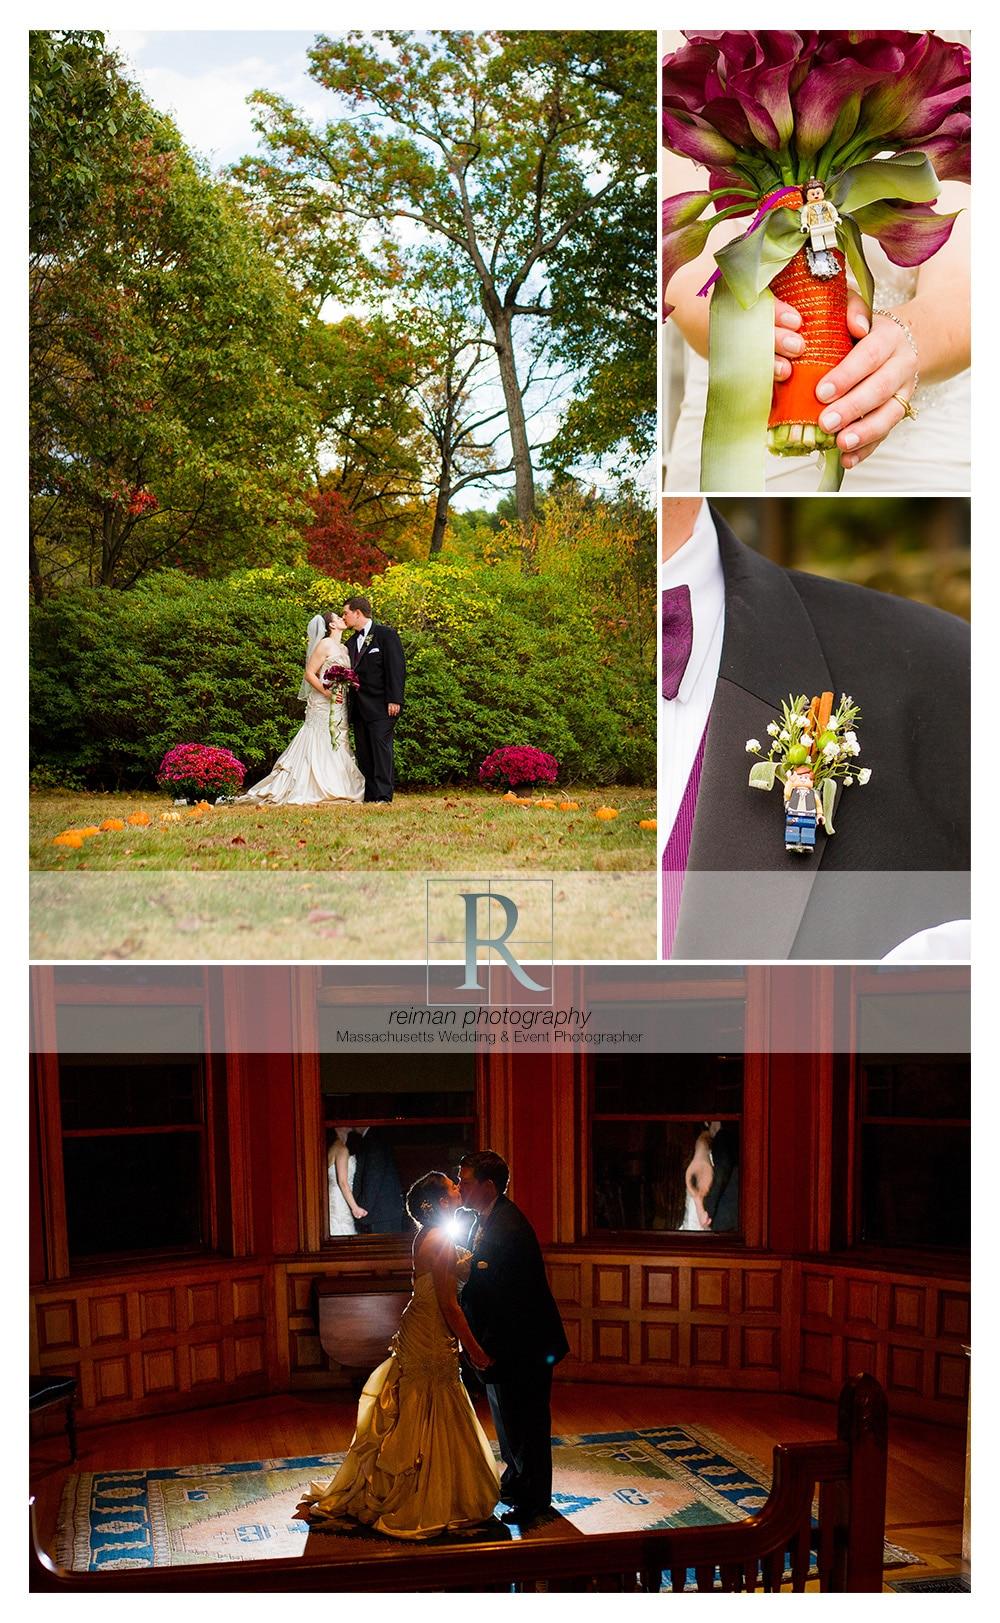 Stonehurst The Robert Treat Paine Estate, Wedding, Reiman Photography